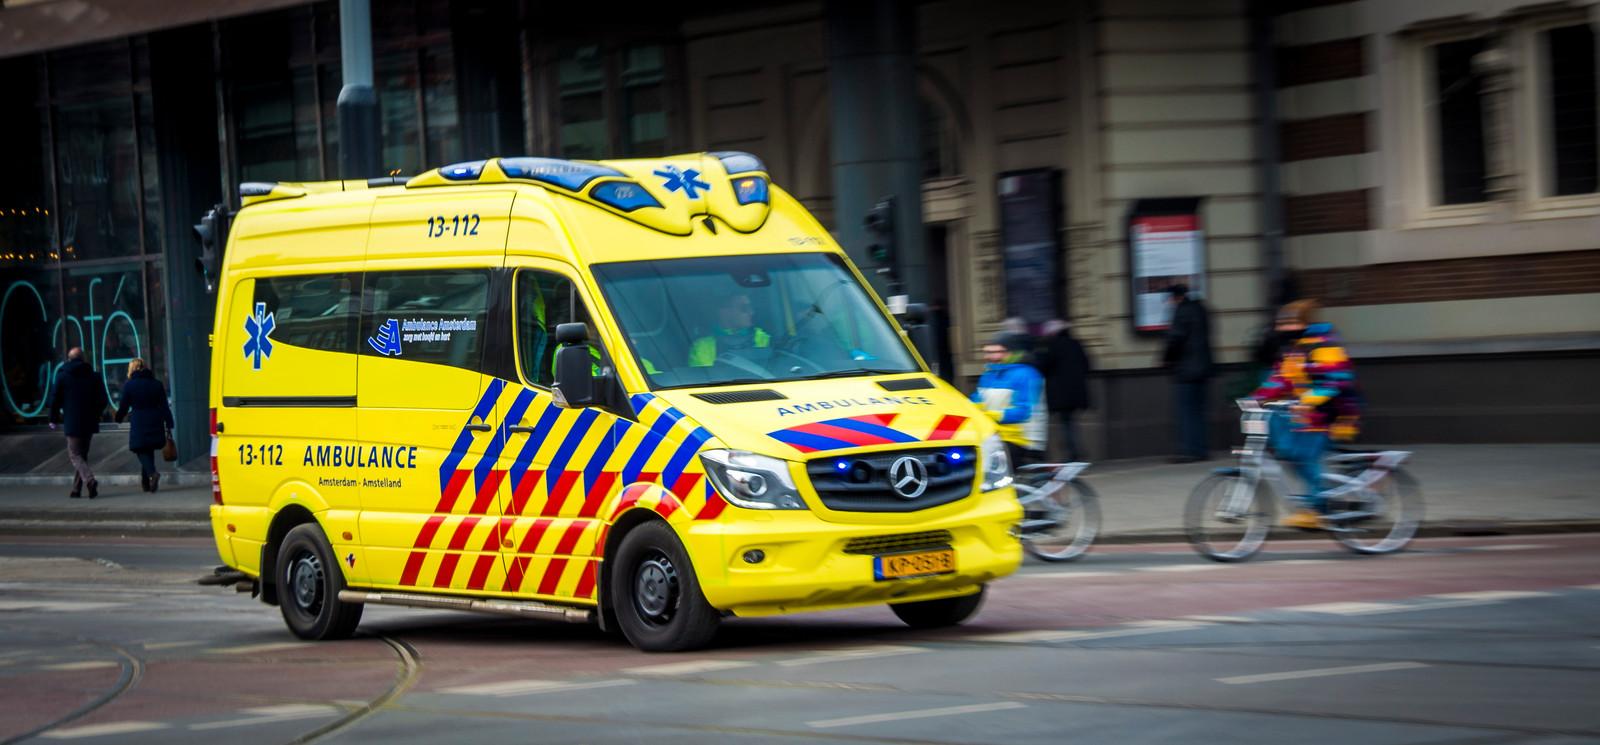 Ambulancevervoer in Amsterdam (foto ter illustratie)